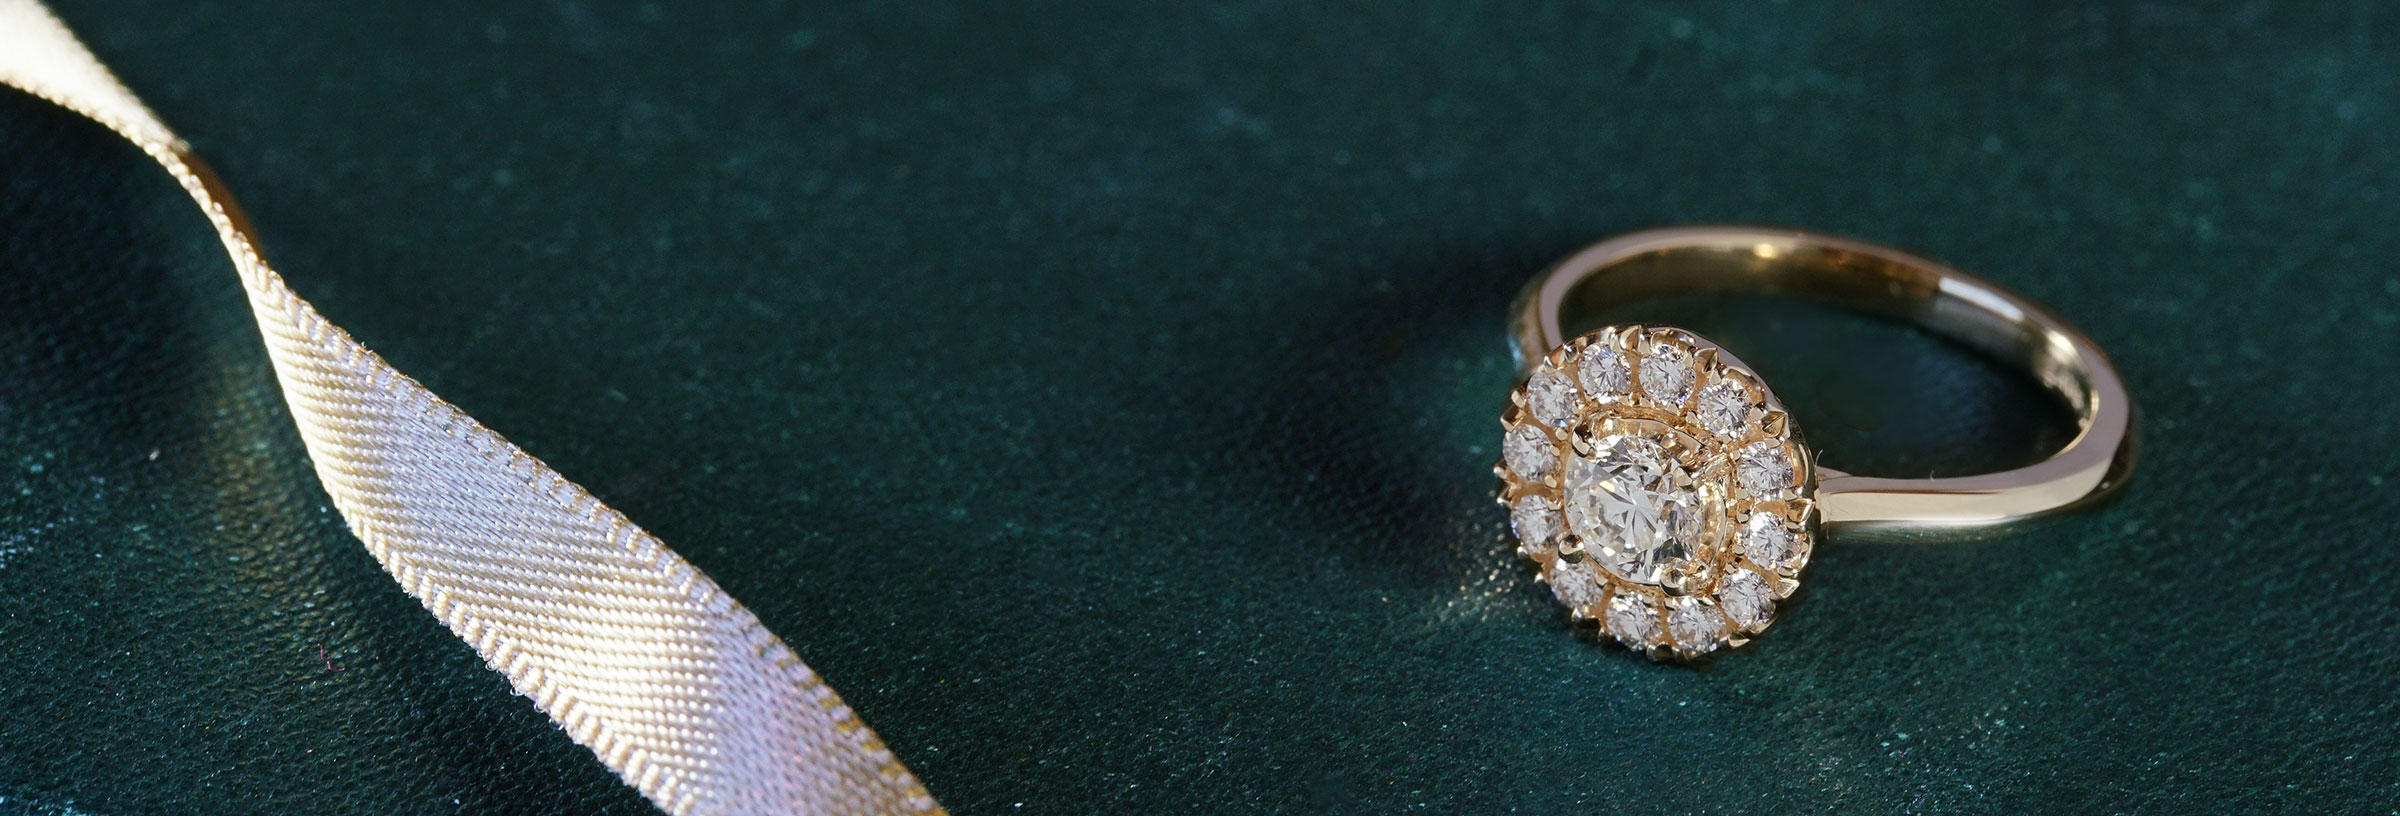 yellow-gold-diamond-halo-style-engagement-ring